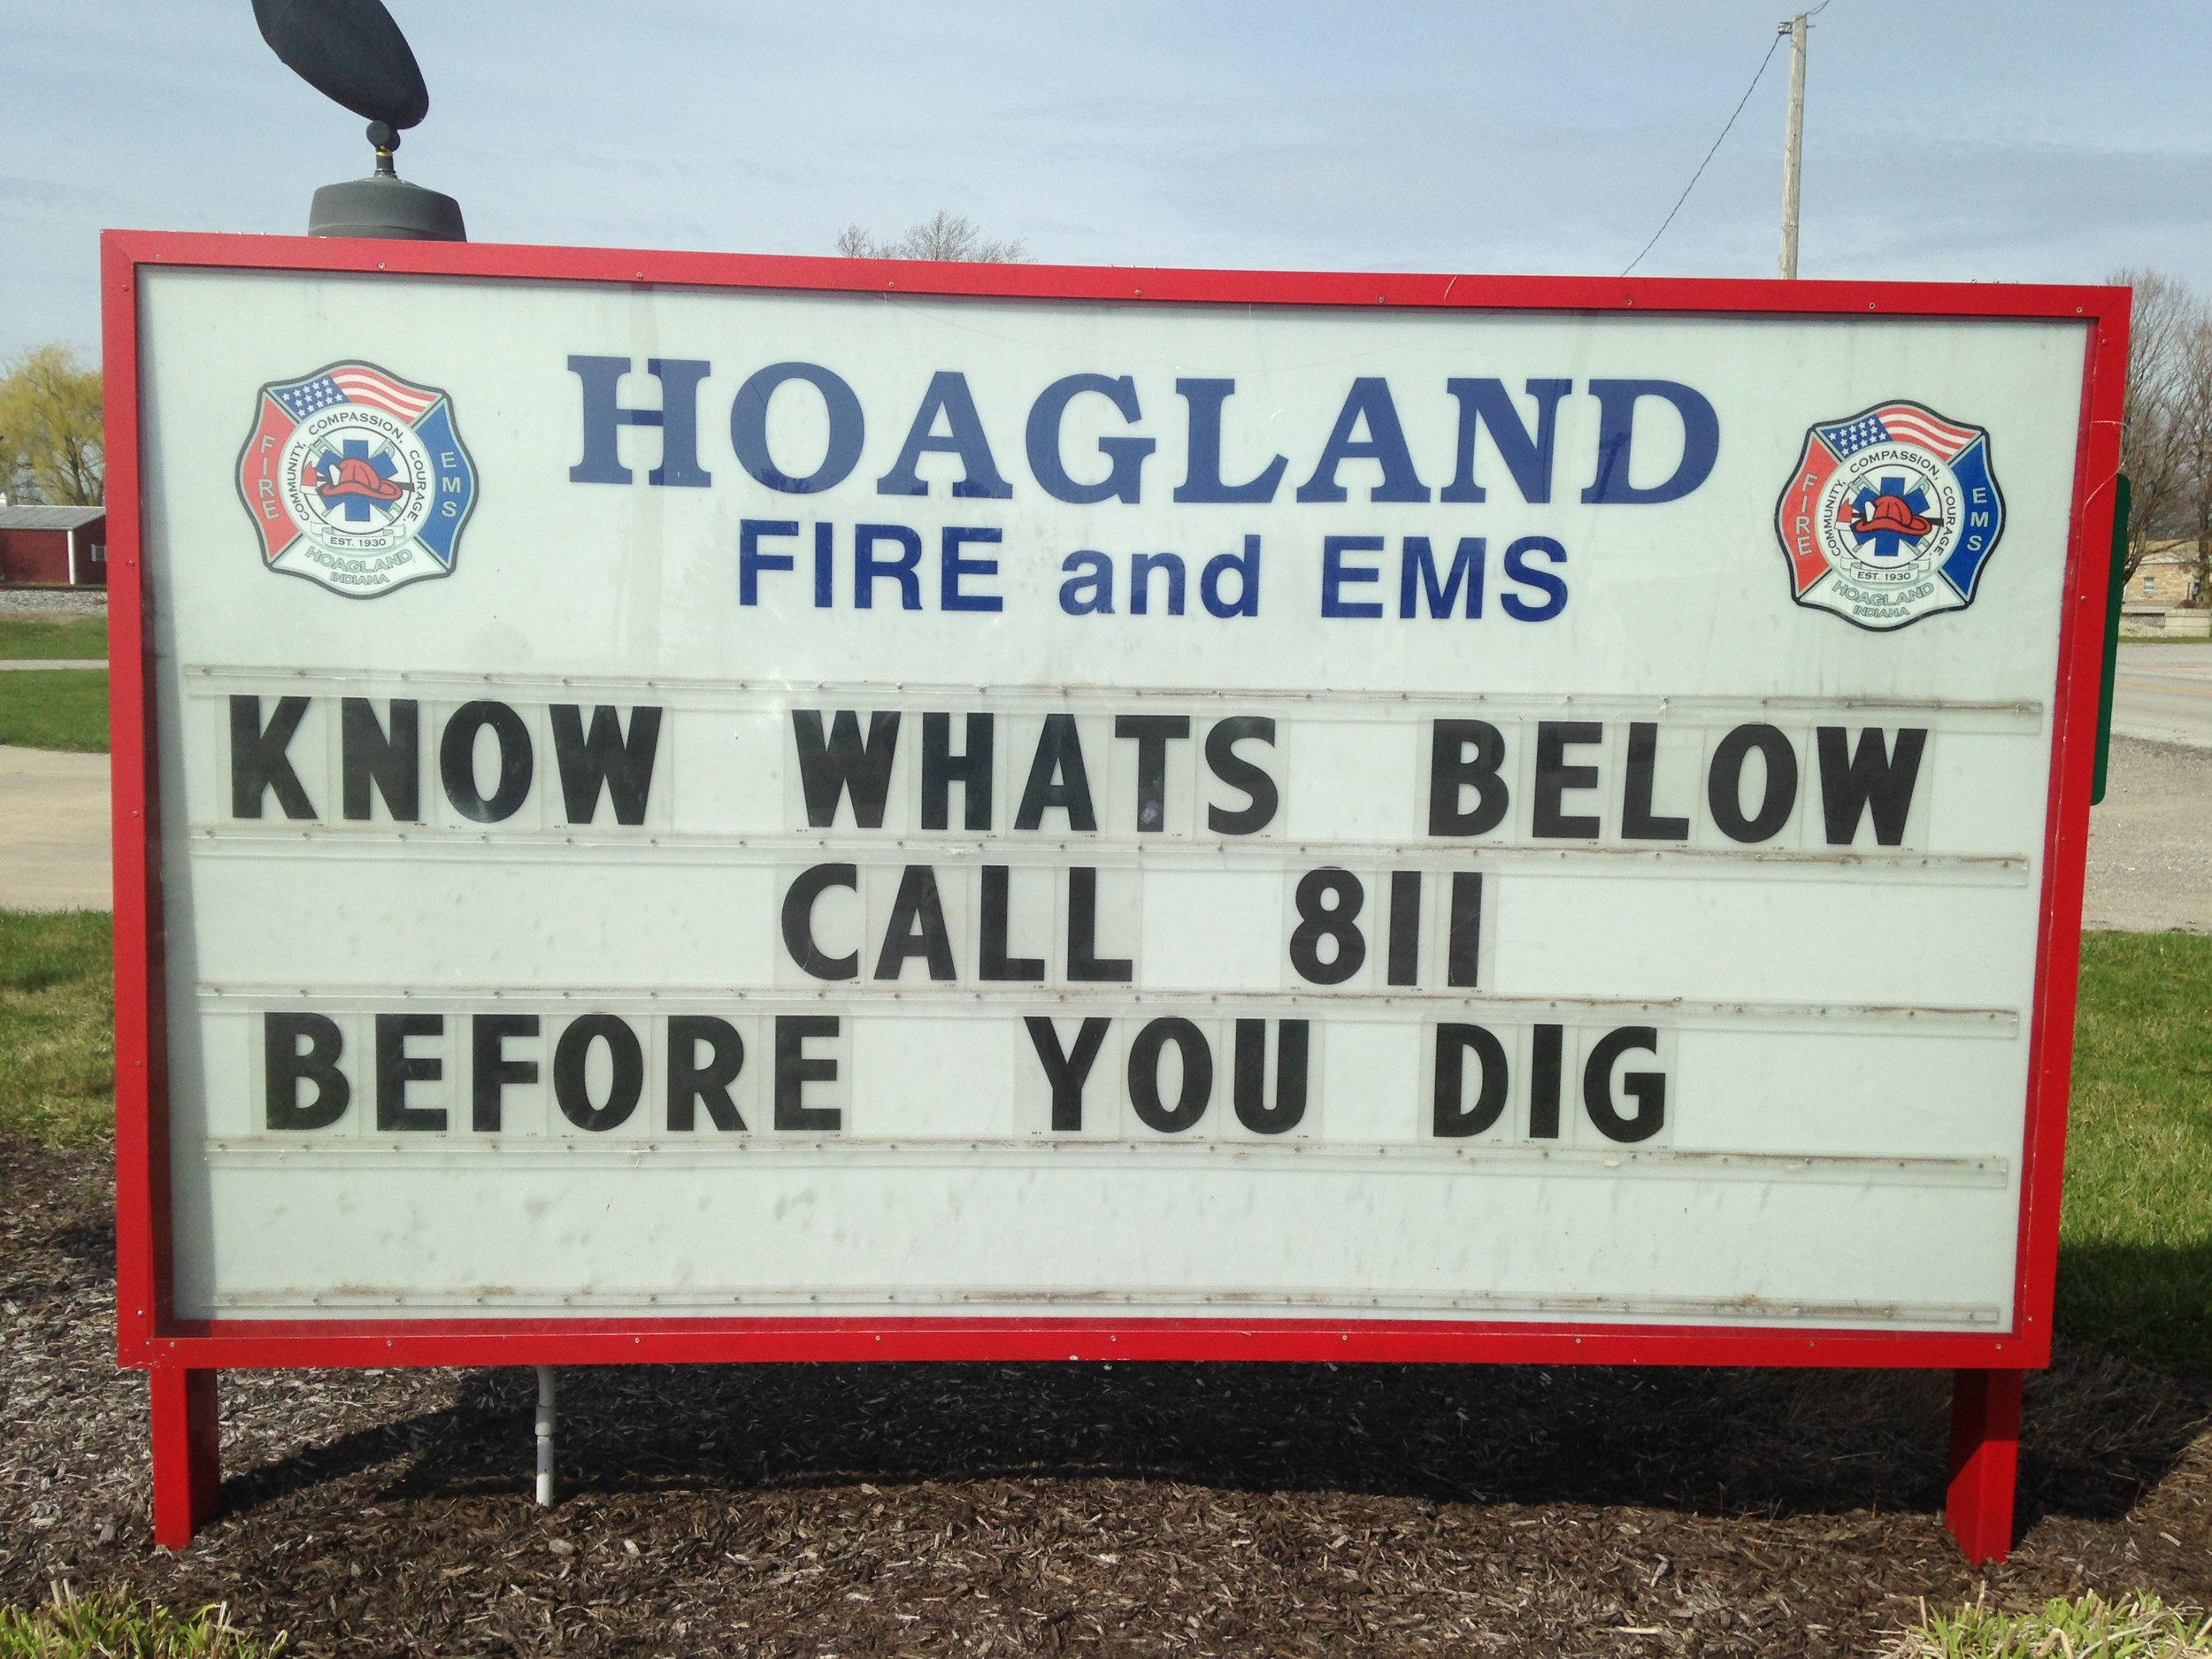 Hoagland Fire & EMS